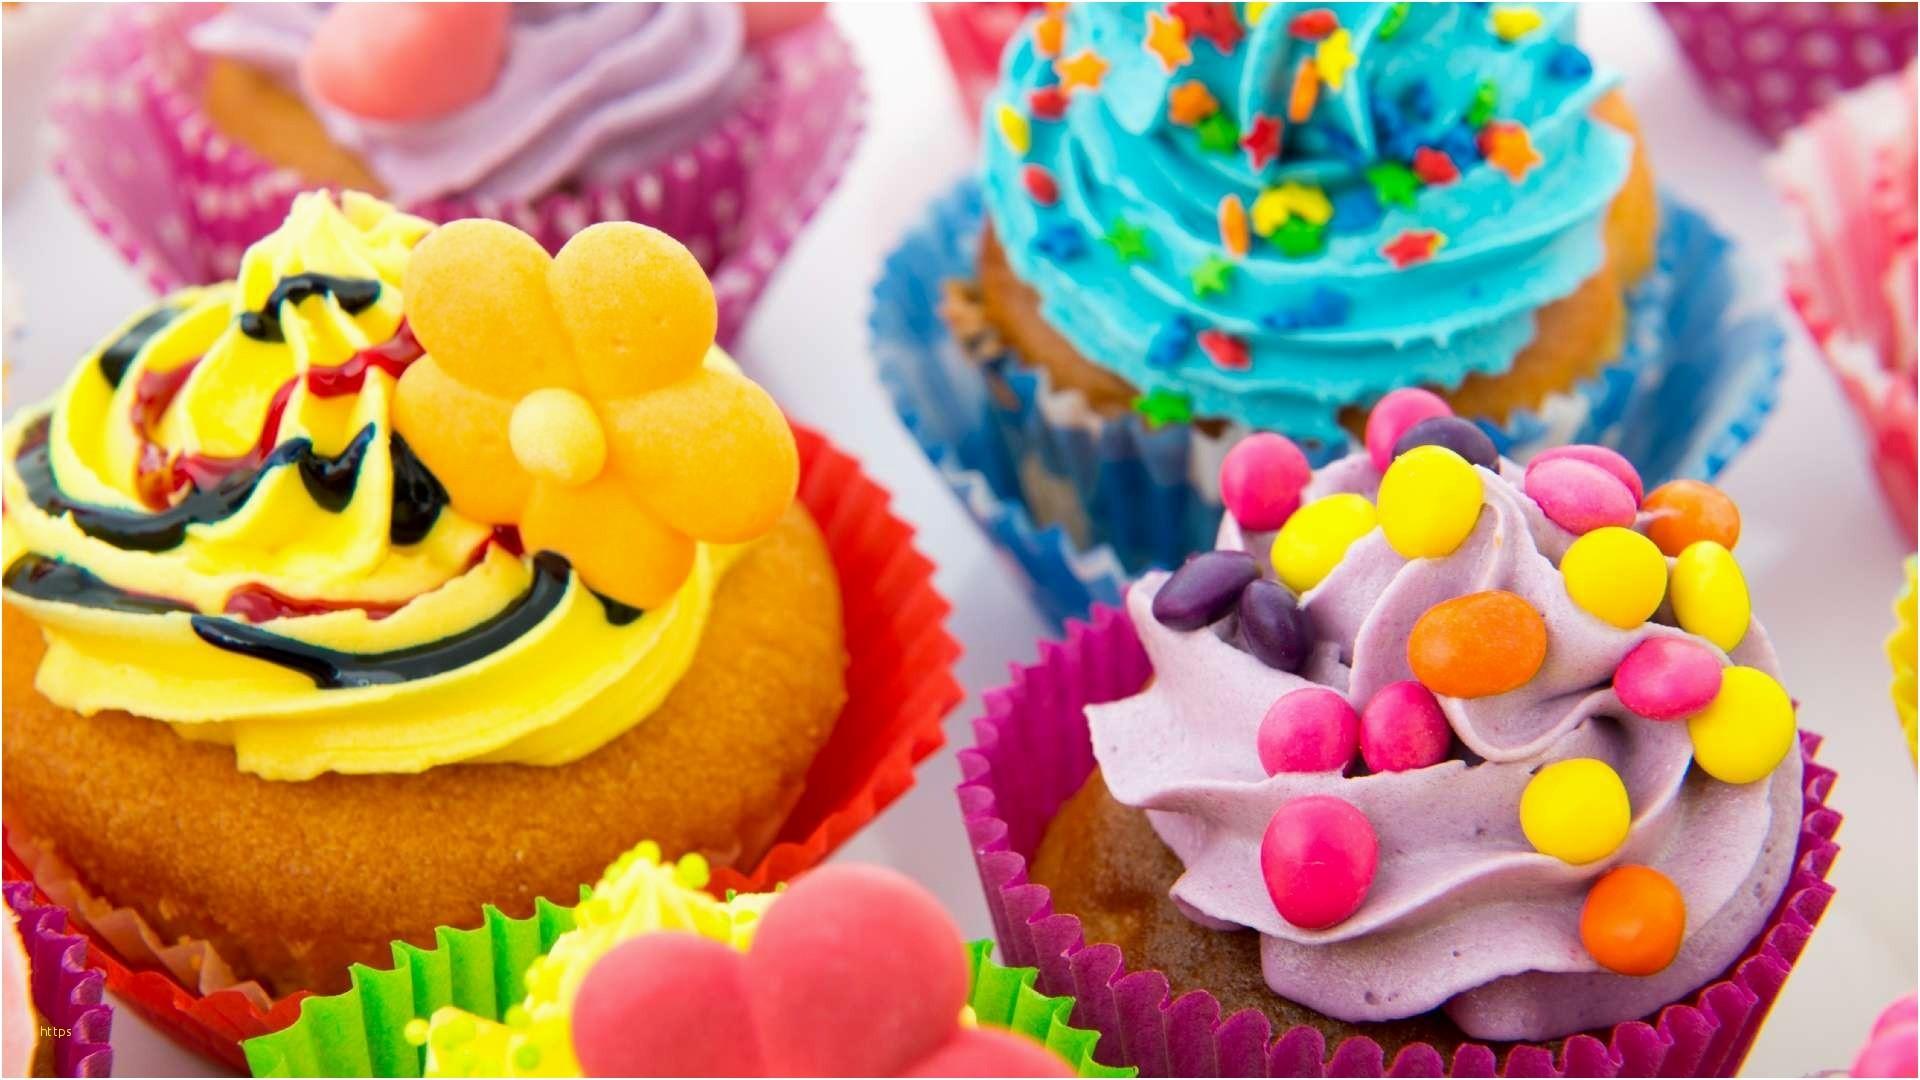 Res: 1920x1080, ... Candy Wallpaper Beautiful Cute Candy Wallpaper Wallpapersafari ...